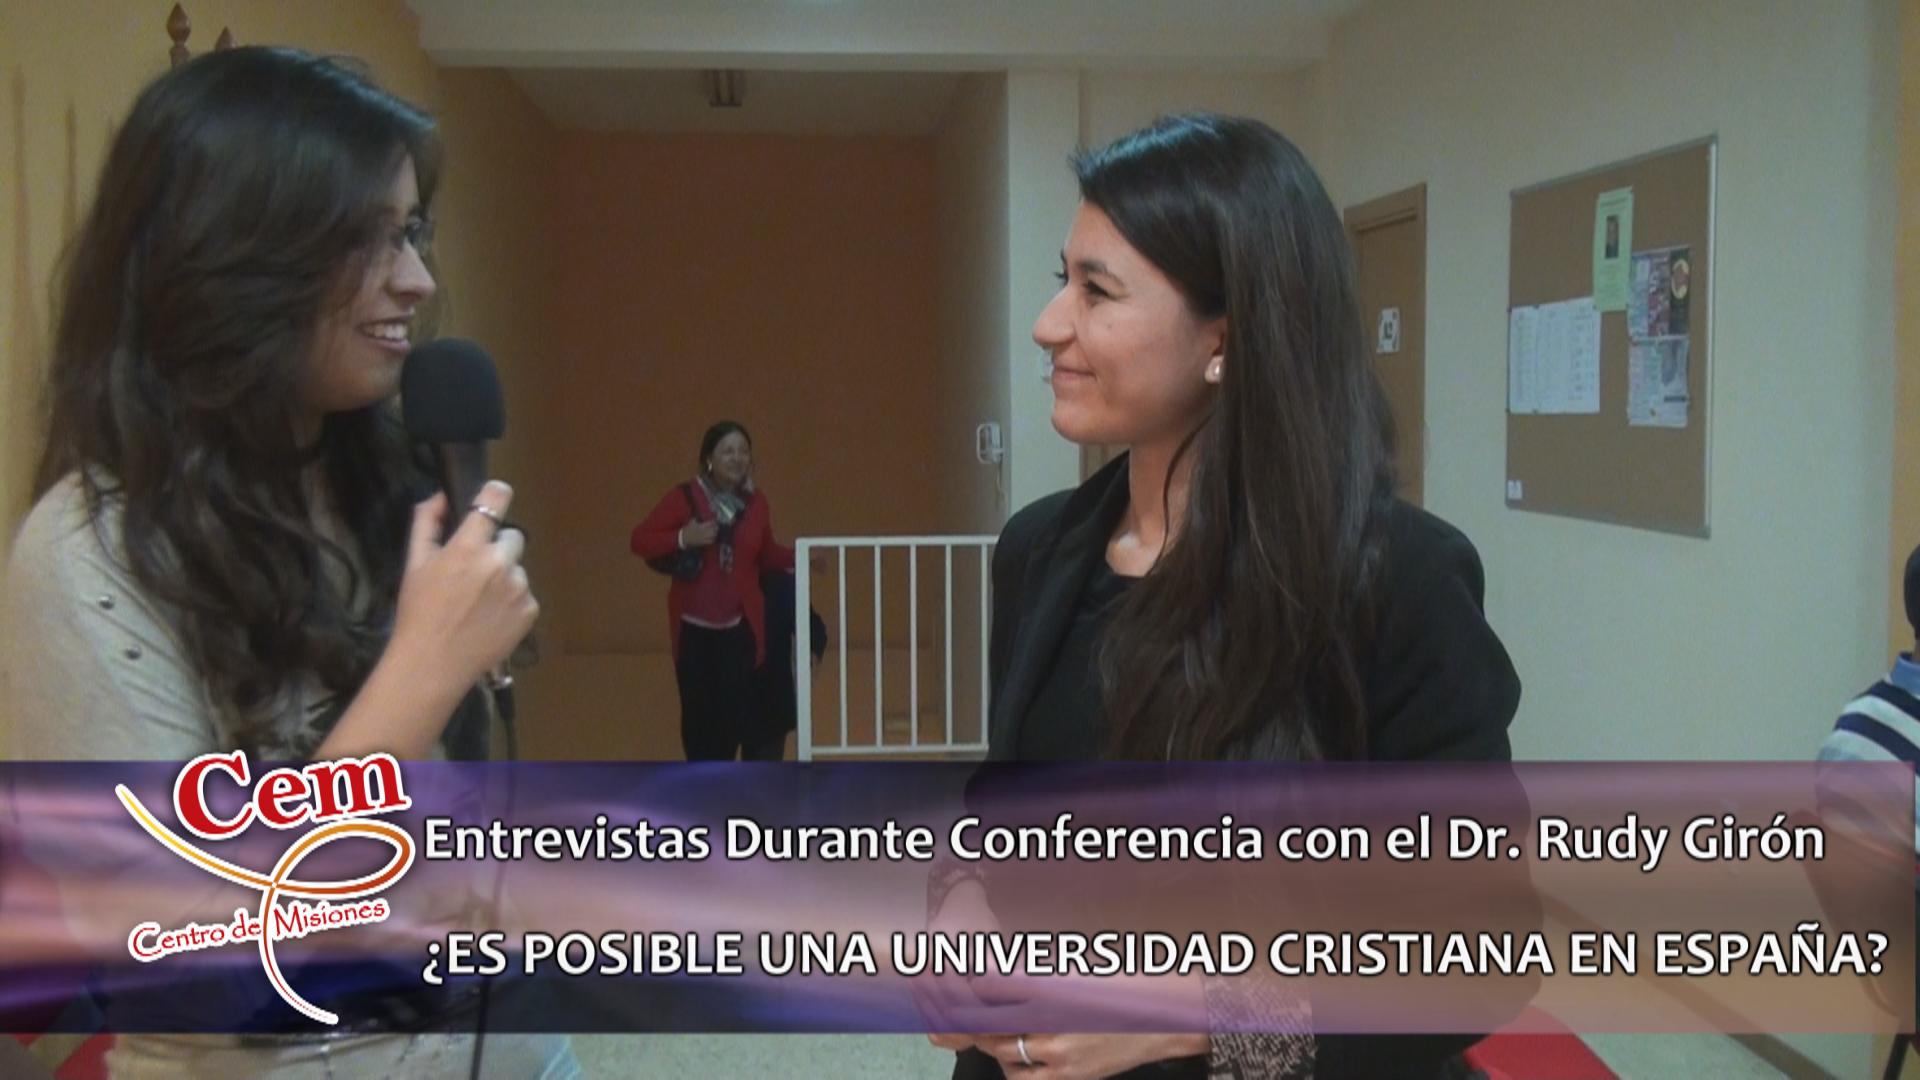 Entrevistas Durante Conferencia Dr. Rudy Girón – Valencia – 2014